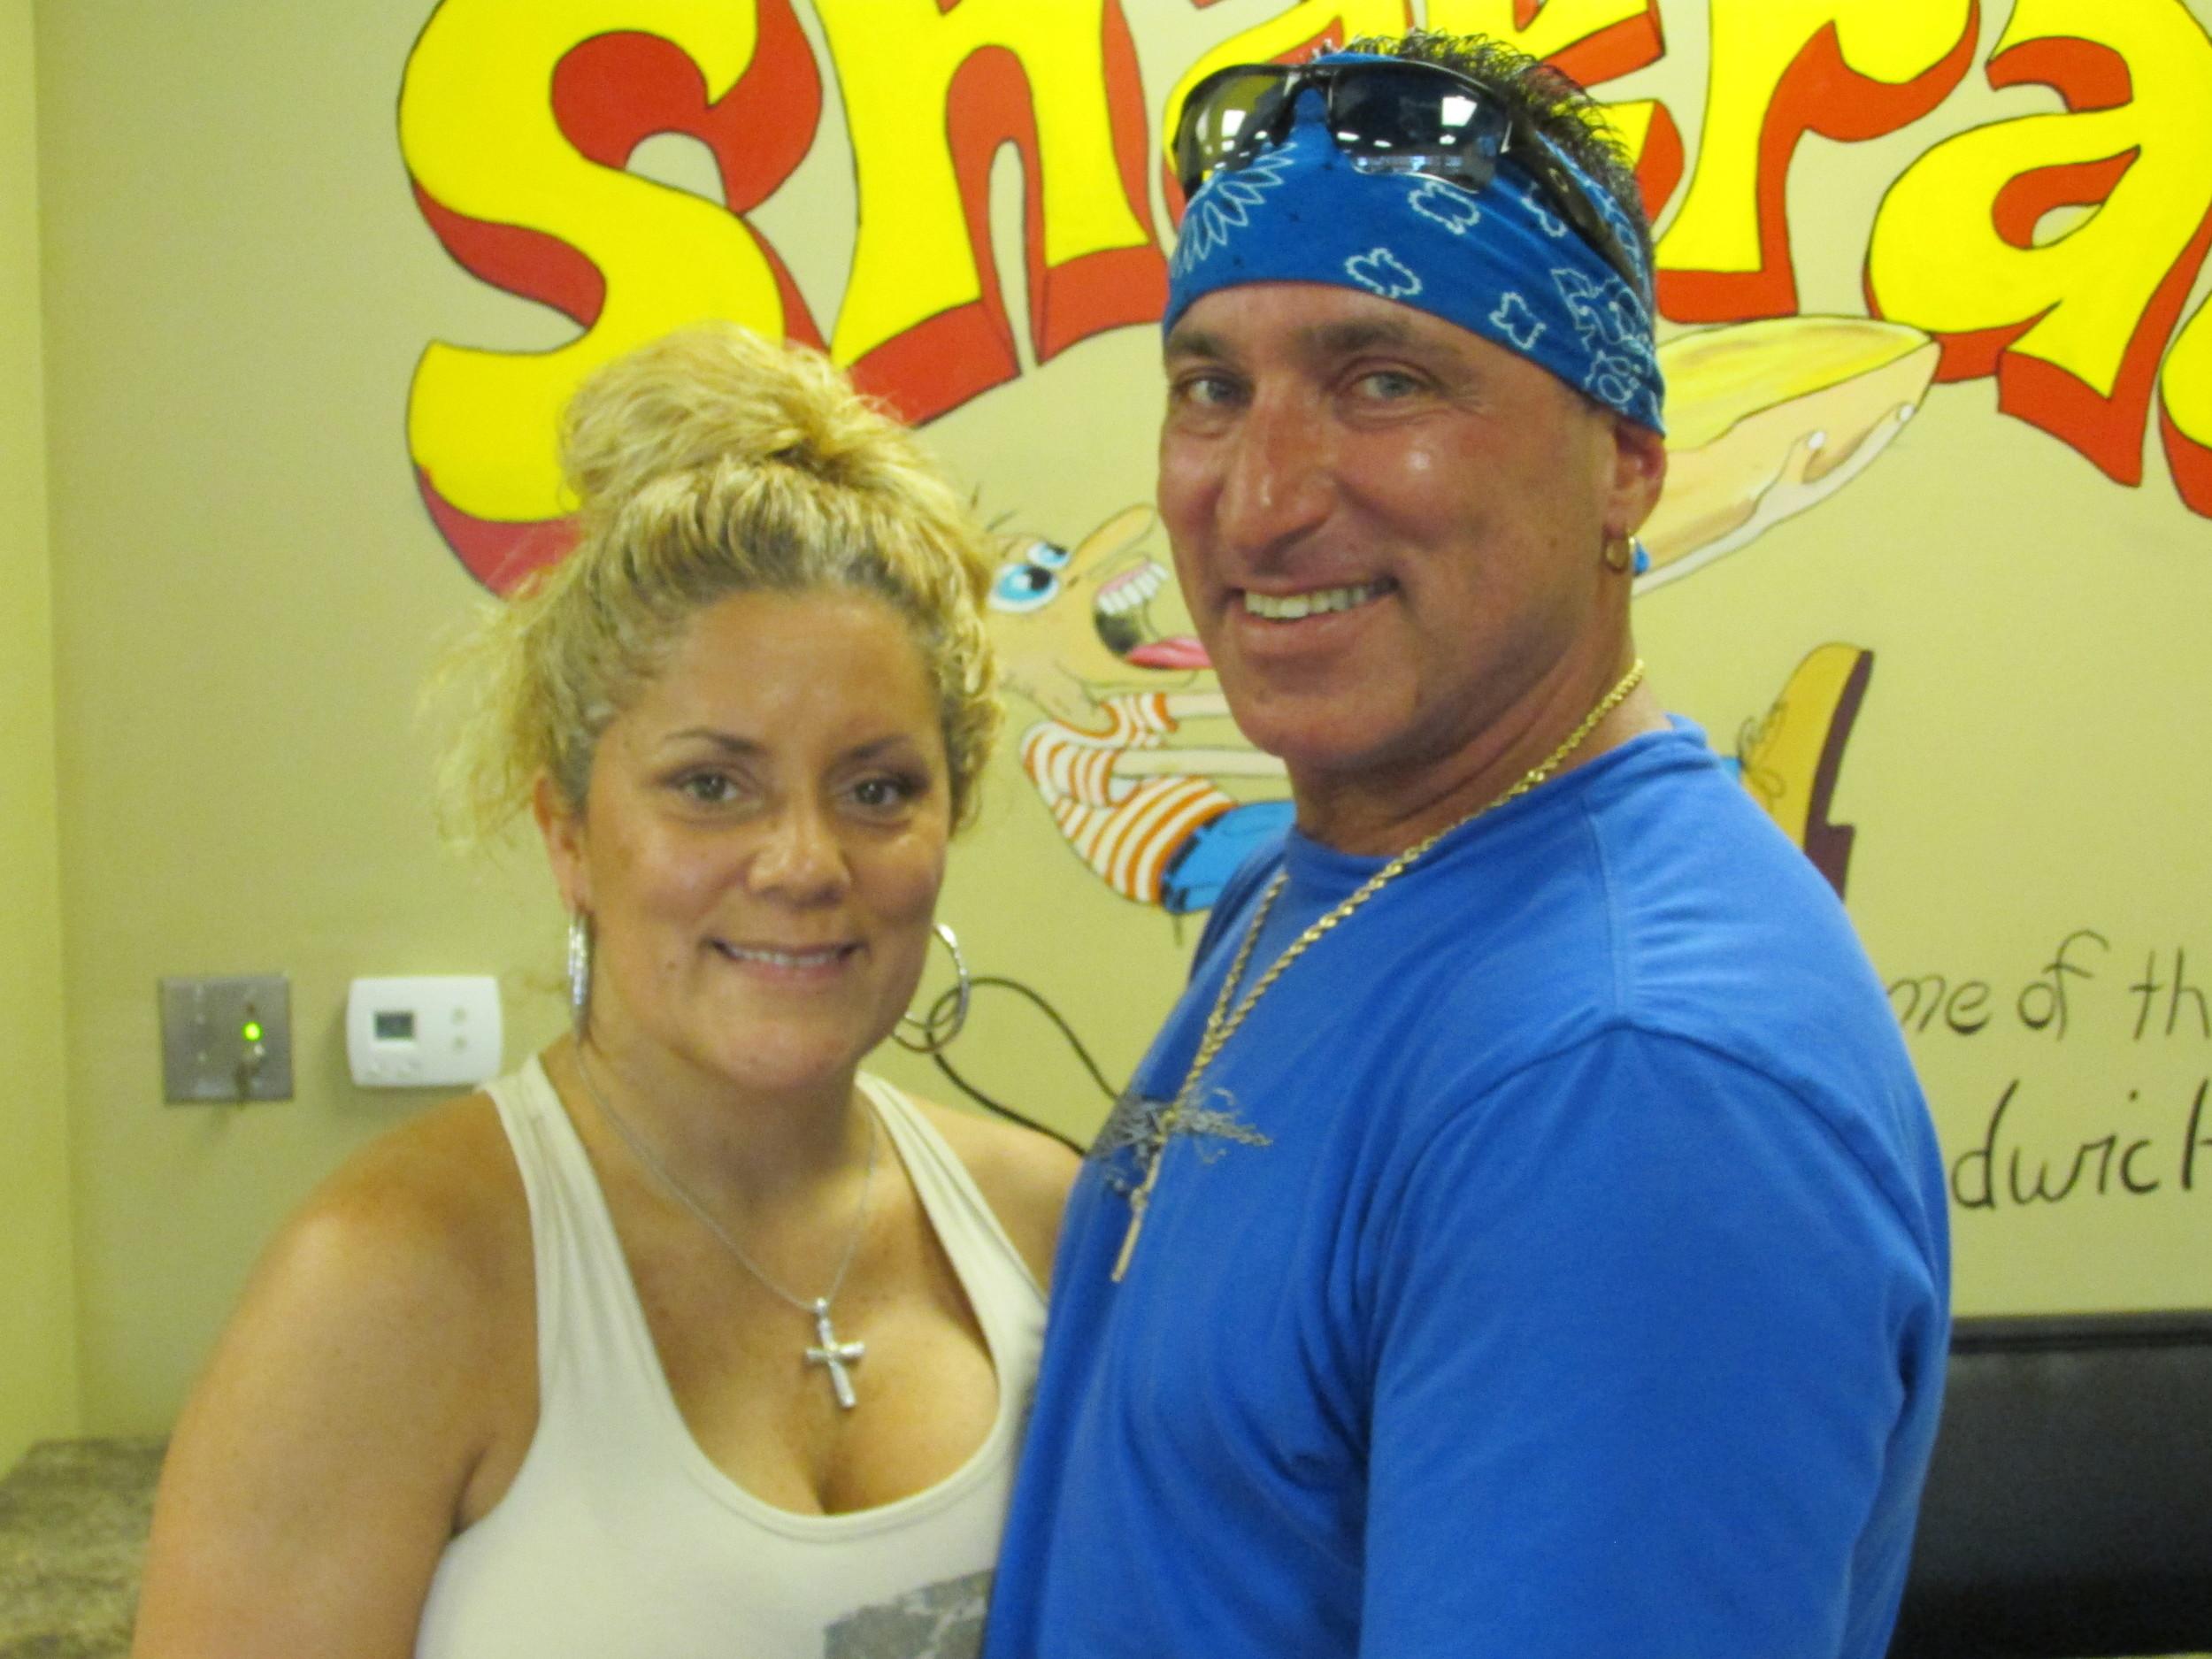 Jeff and Anuhea Shakra